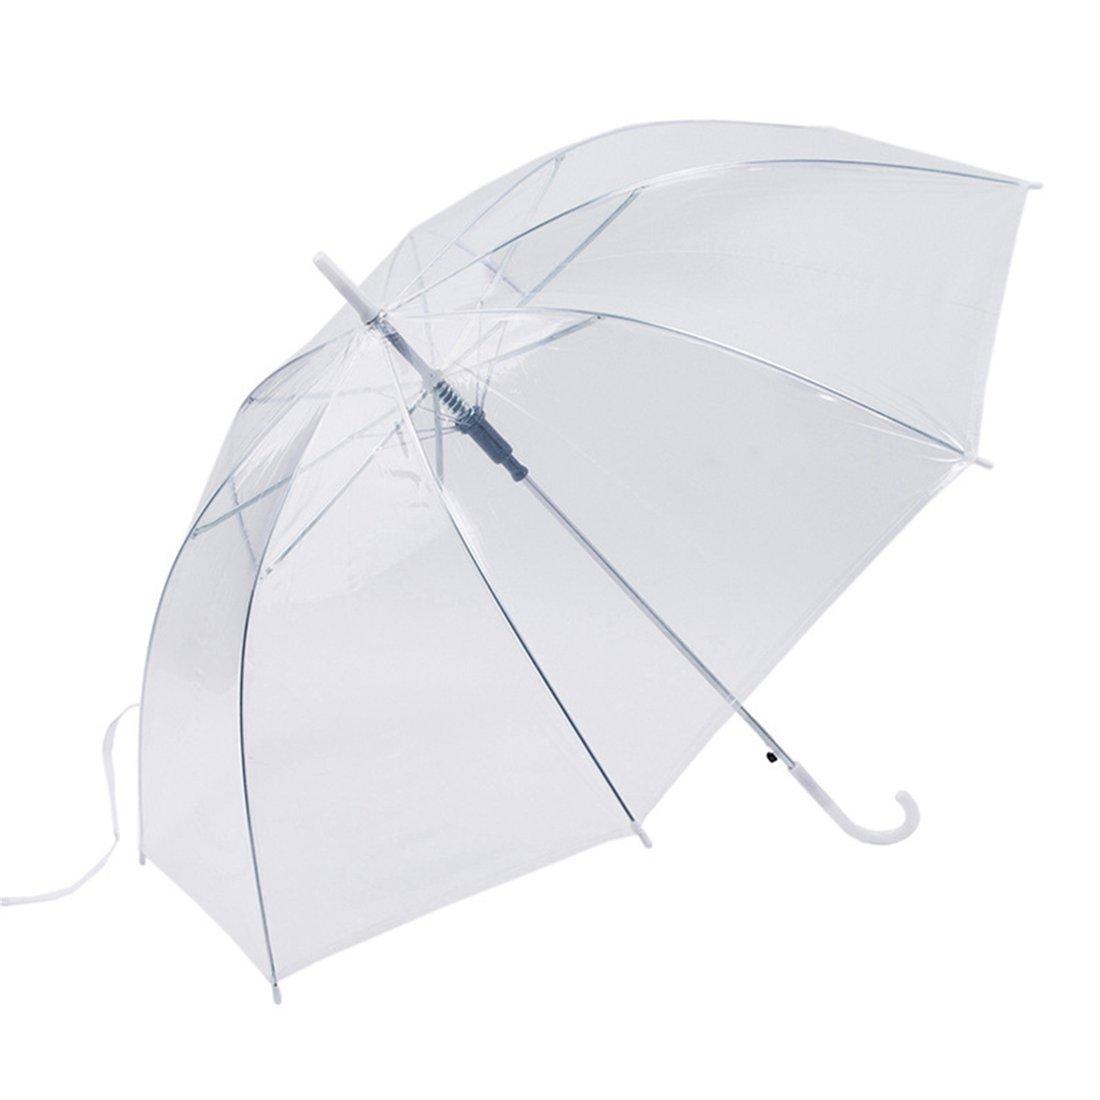 Paraguas a prueba de viento transparente transparente Paraguas paraguas automático para el banquete de boda Favor Stand Inside Out Rain Protección: ...